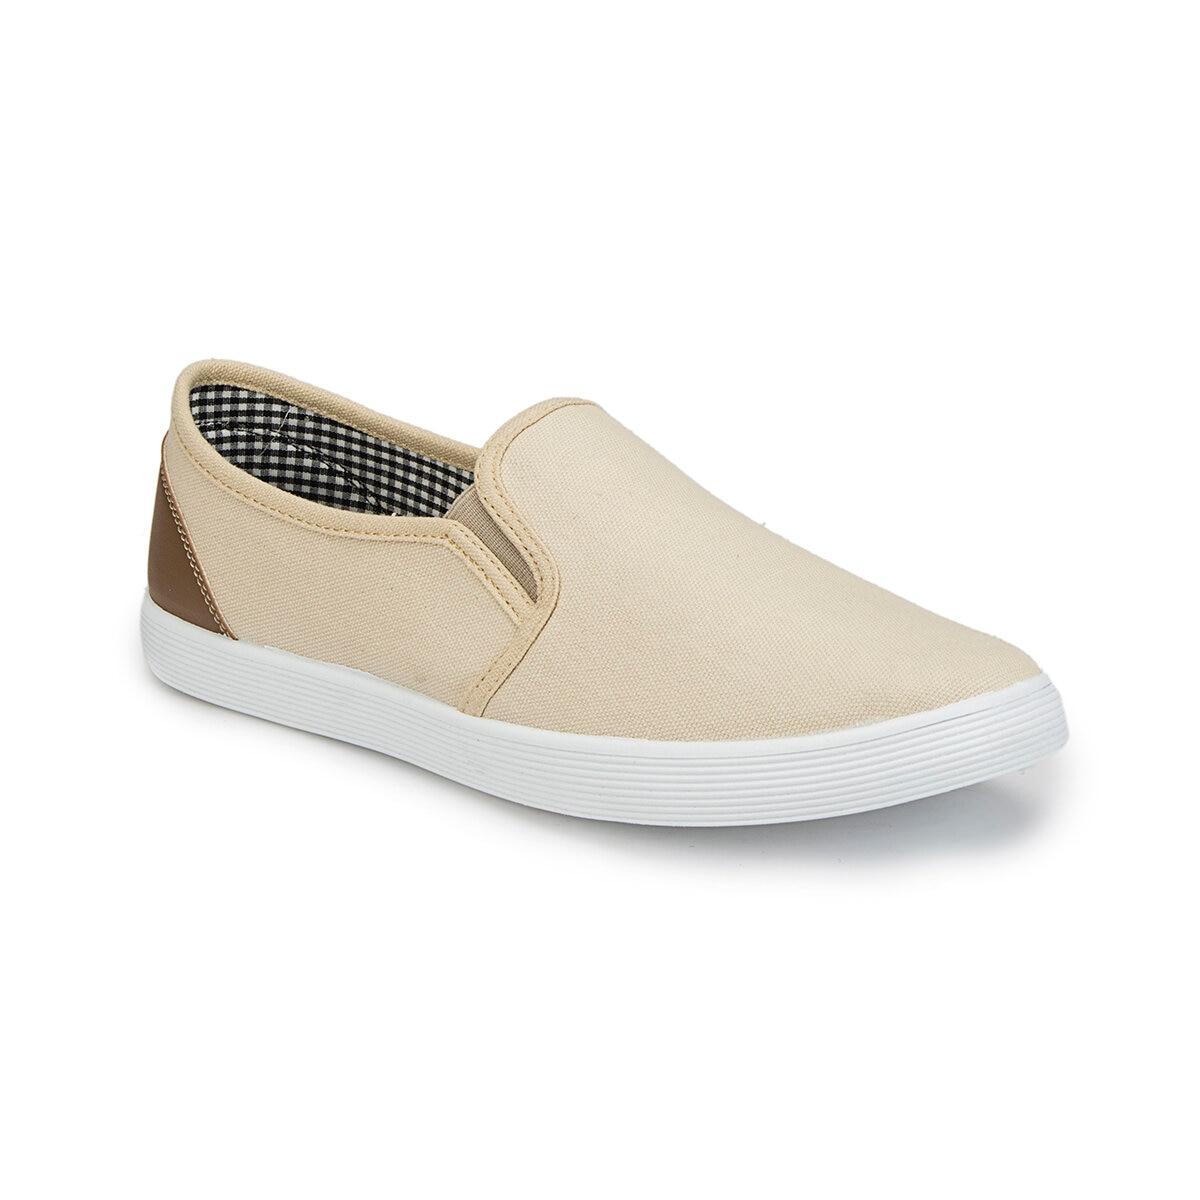 FLO 81.353984.M ベージュ男性の靴ポラリス